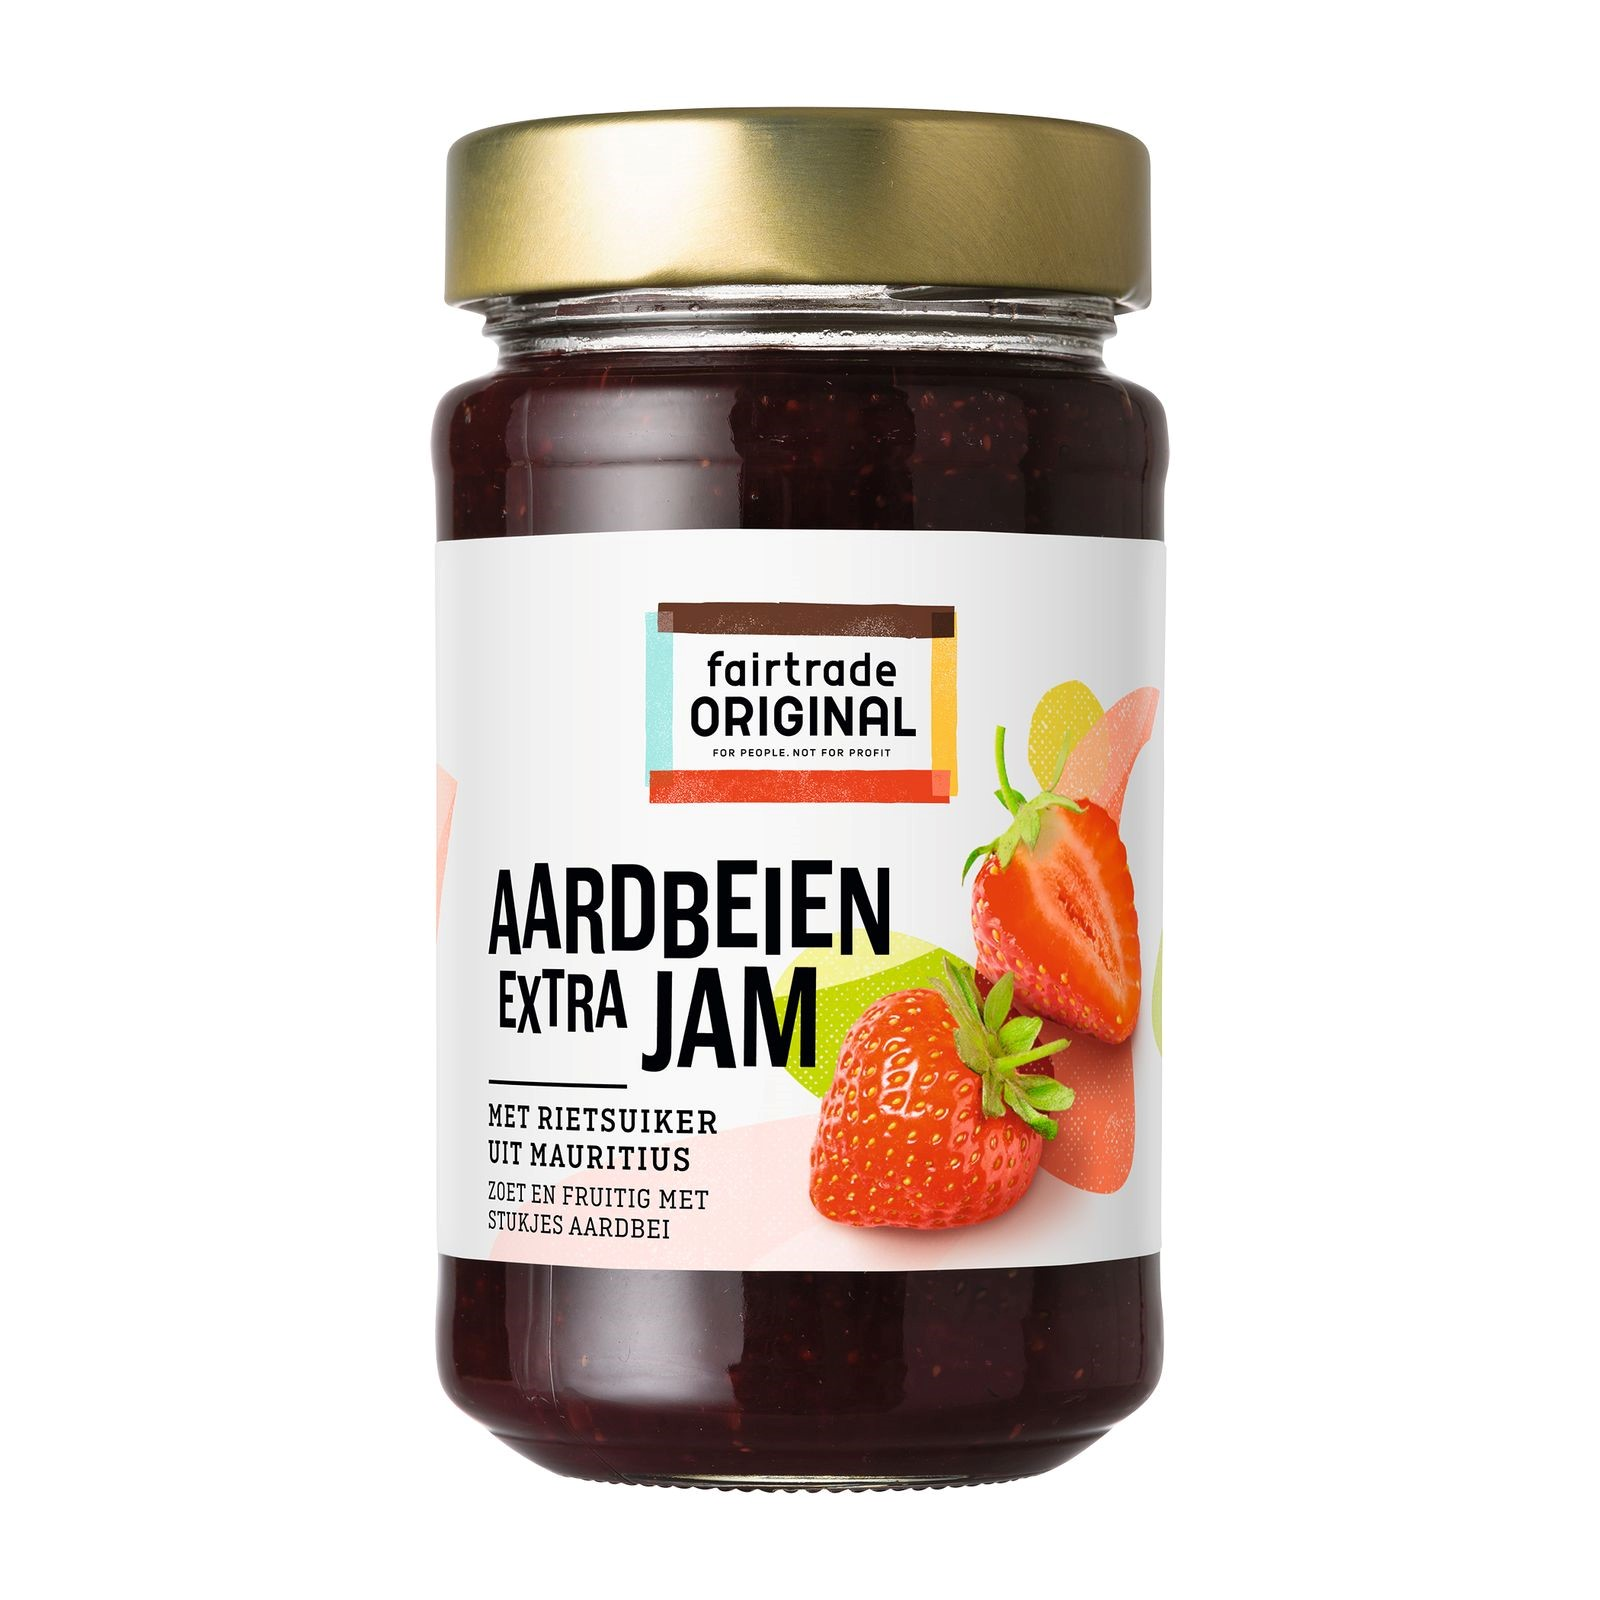 Fair Trade Original Aardbeien extra jam, MH, 280g